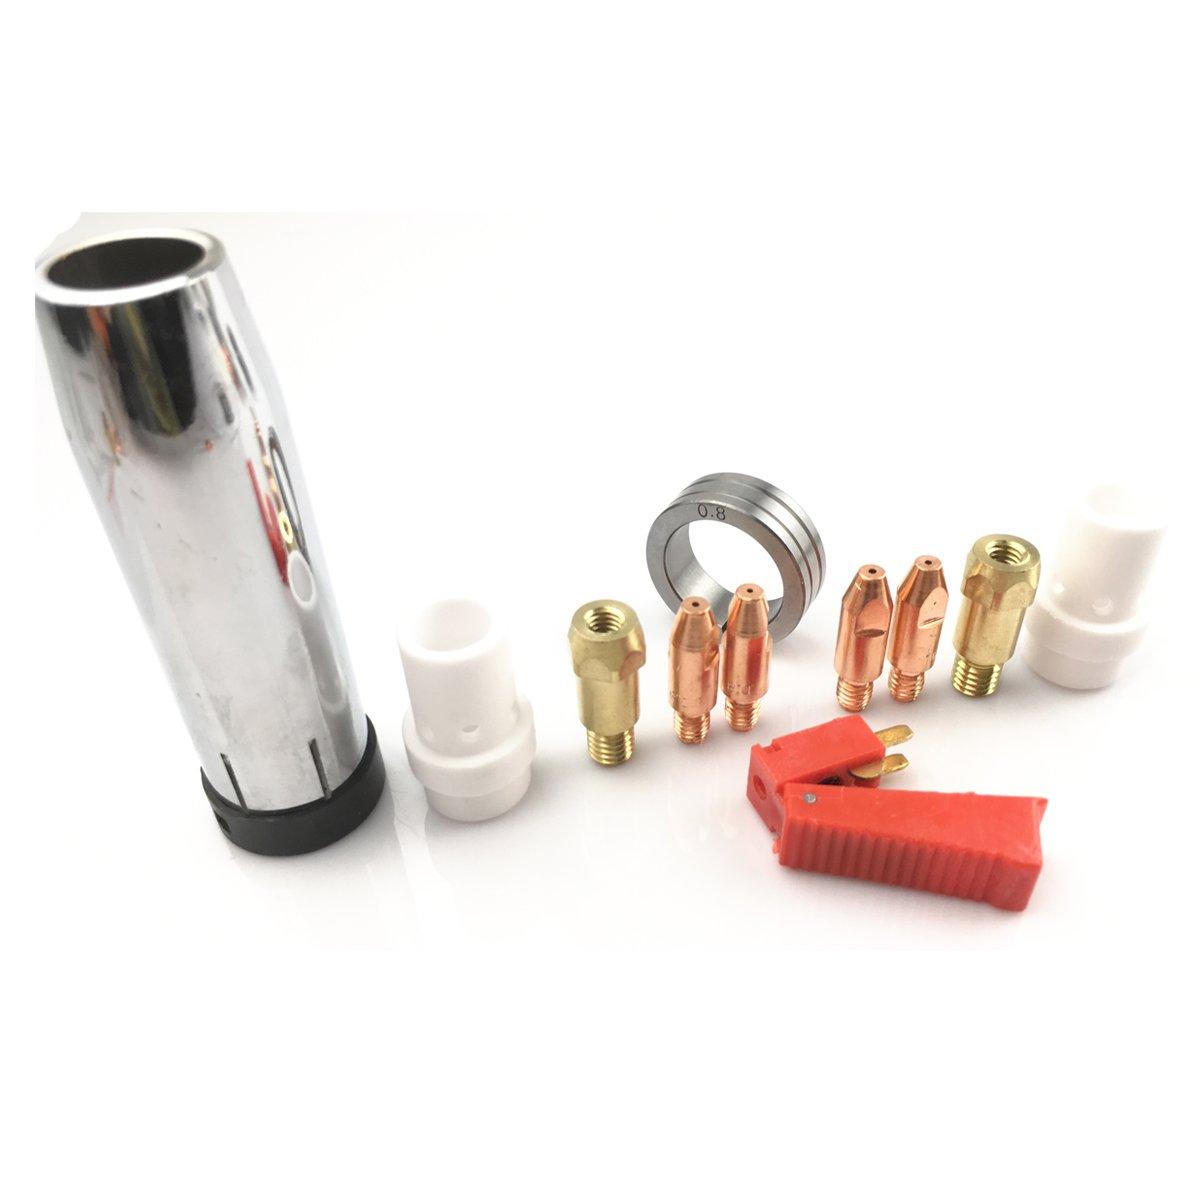 10pcs Soldadura MIG Consumibles para pistola 36 KD linterna difusor de boquilla de gas M6 titulares puntas 0,8/1.0 mm doble tamaño rollos de 30 mm OD: ...